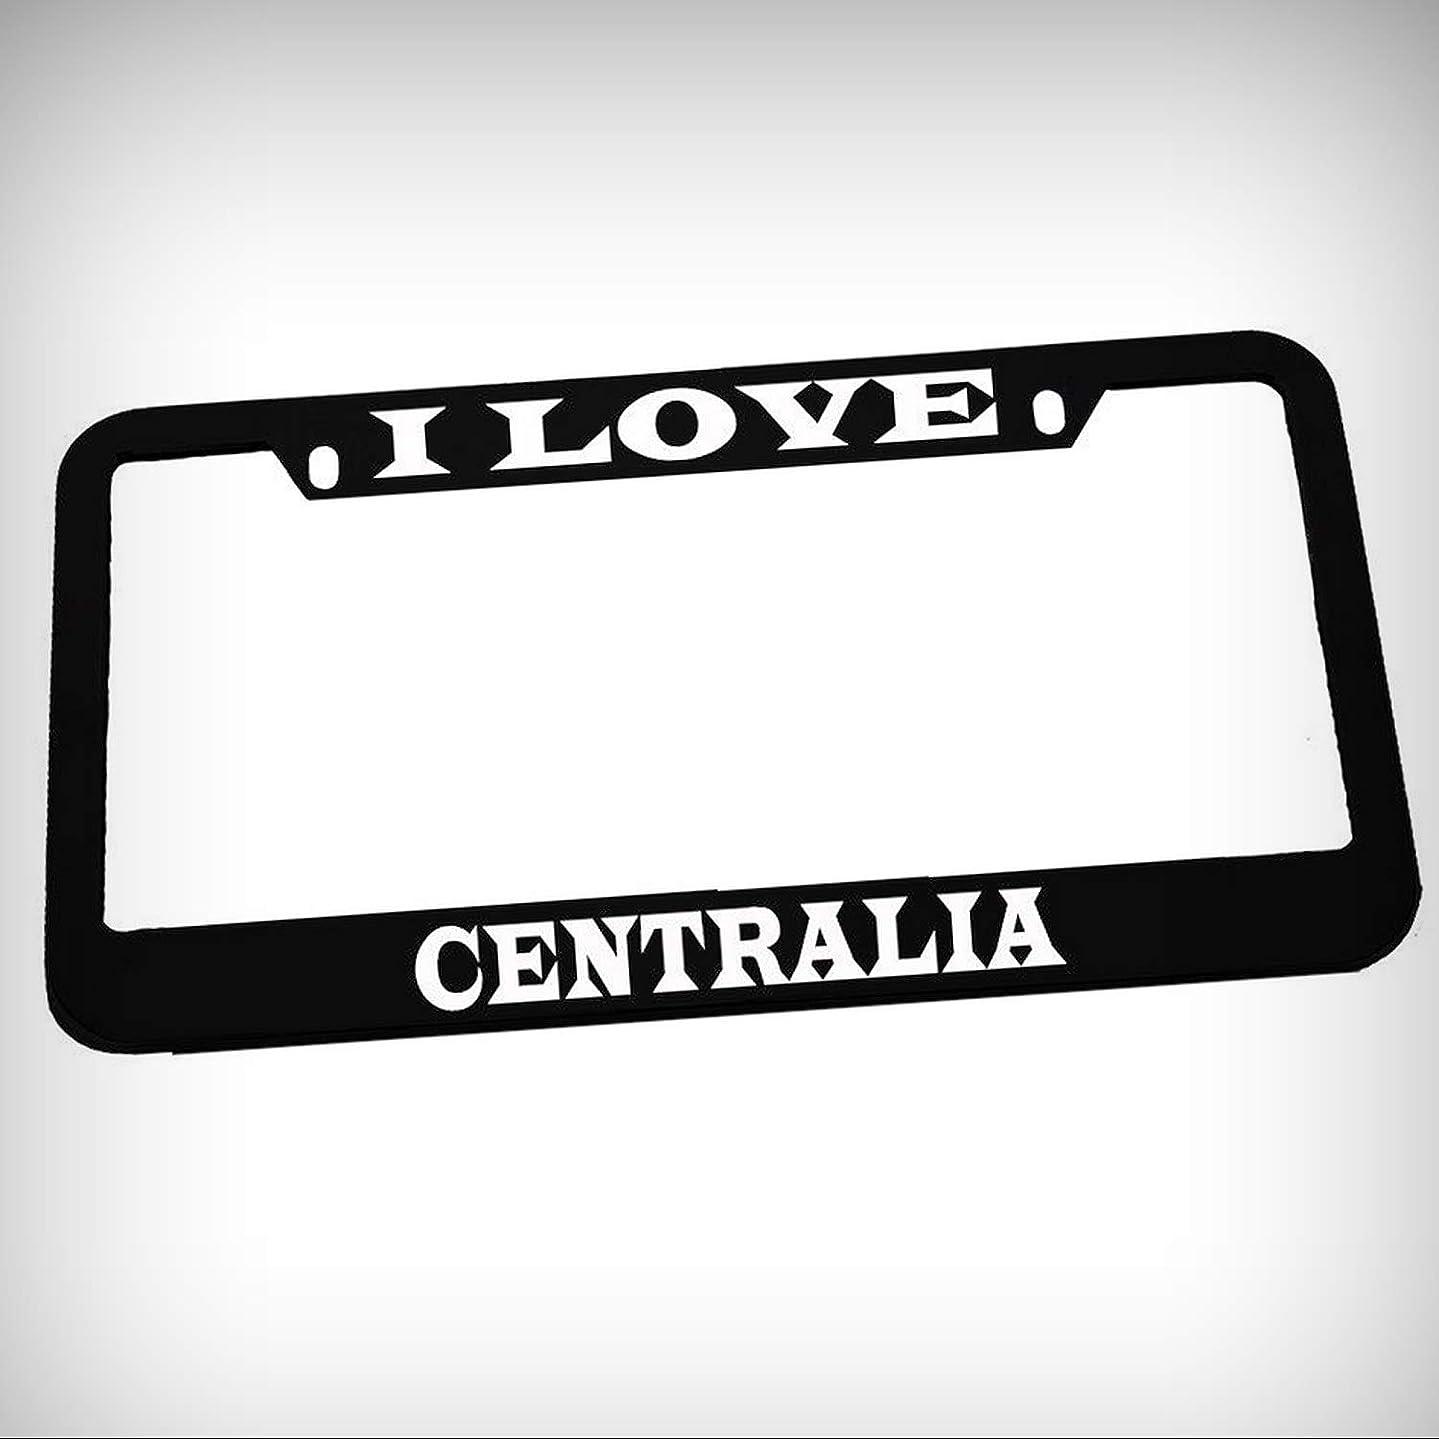 I Love Centralia Zinc Metal Tag Holder Car Auto License Plate Frame Decorative Border - Black Sign for Home Garage Office Decor